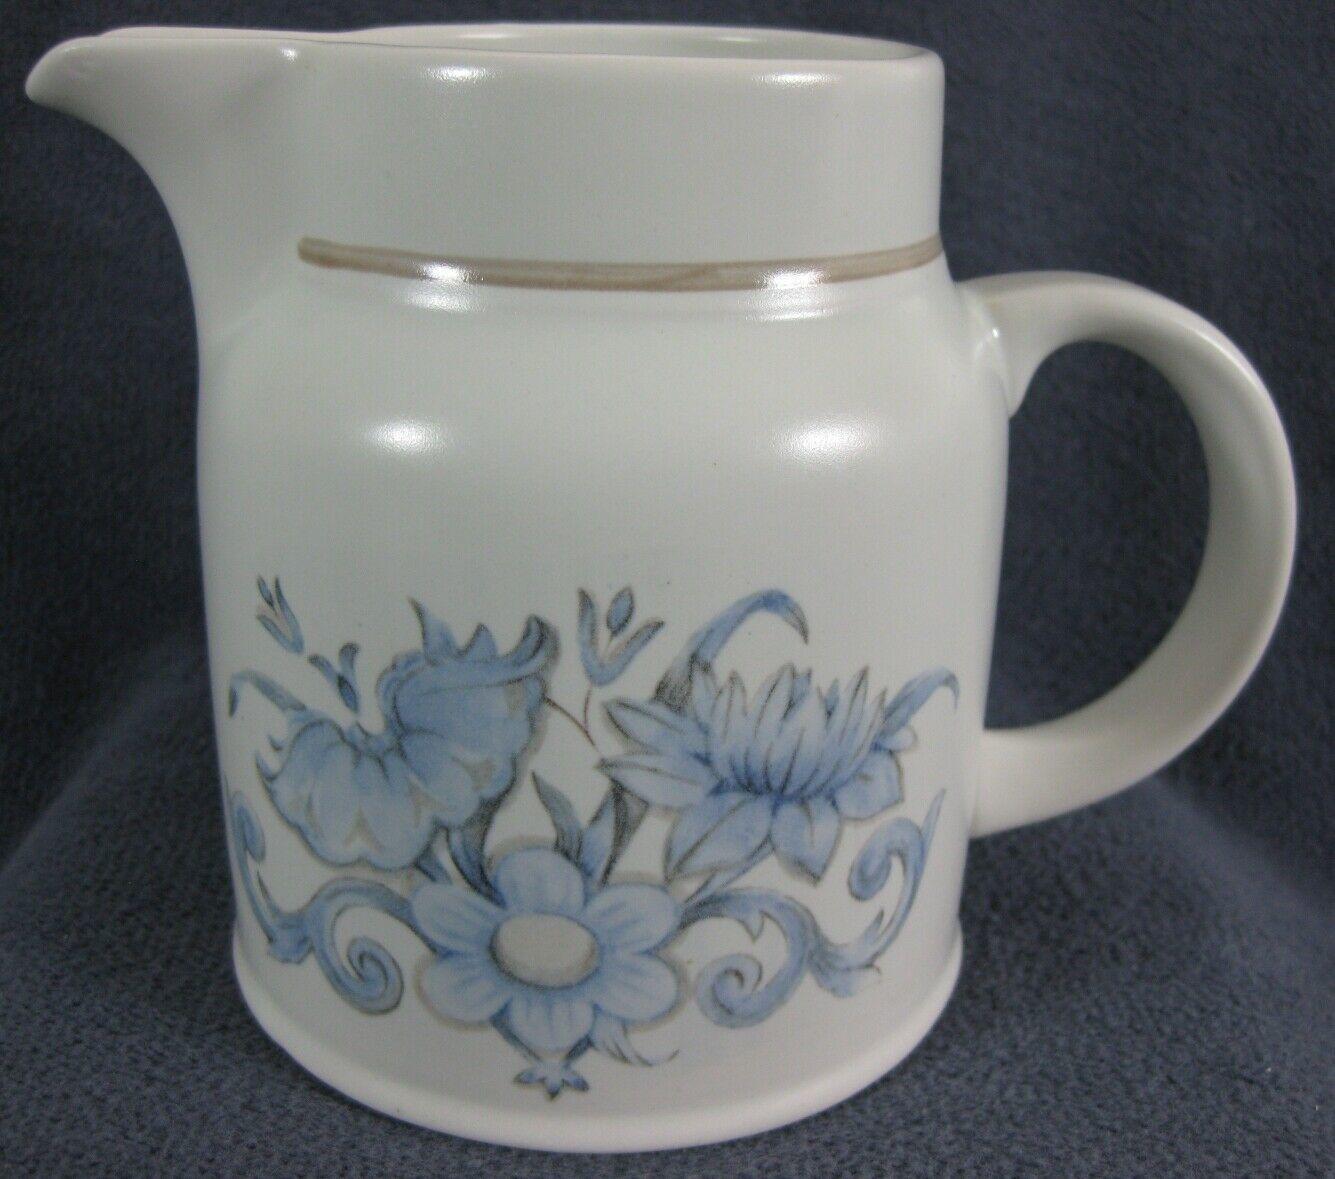 Royal Doulton Inspiration LS1016 Creamer Pitcher Lambethware England Blue Floral